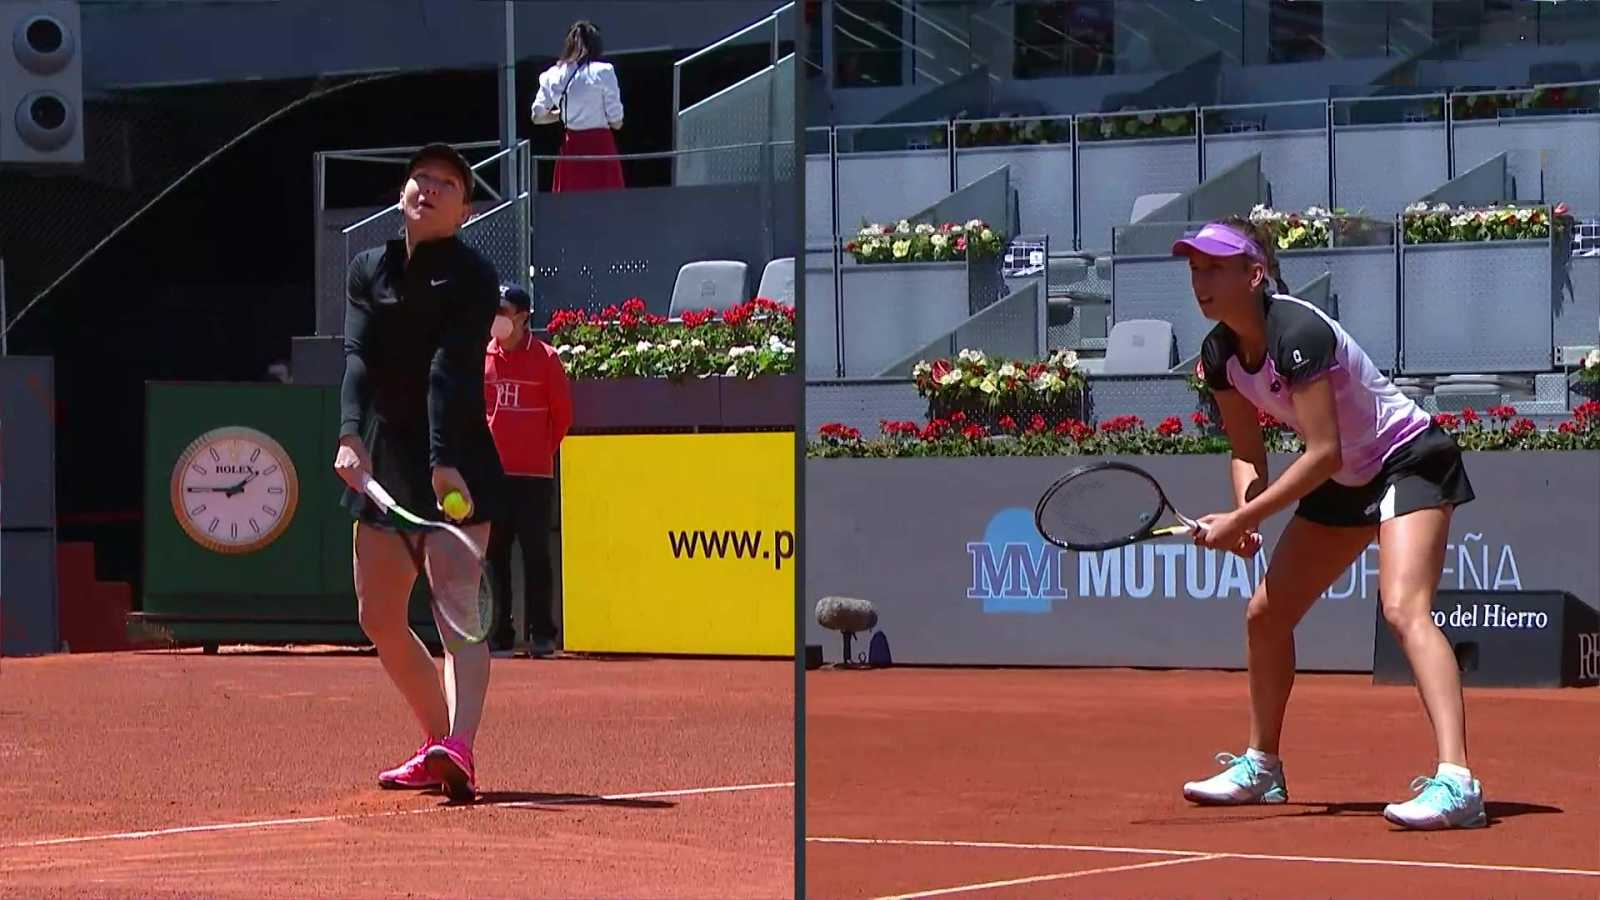 Tenis - WTA Mutua Madrid Open: Elise Mertens - Simona Halep - ver ahora